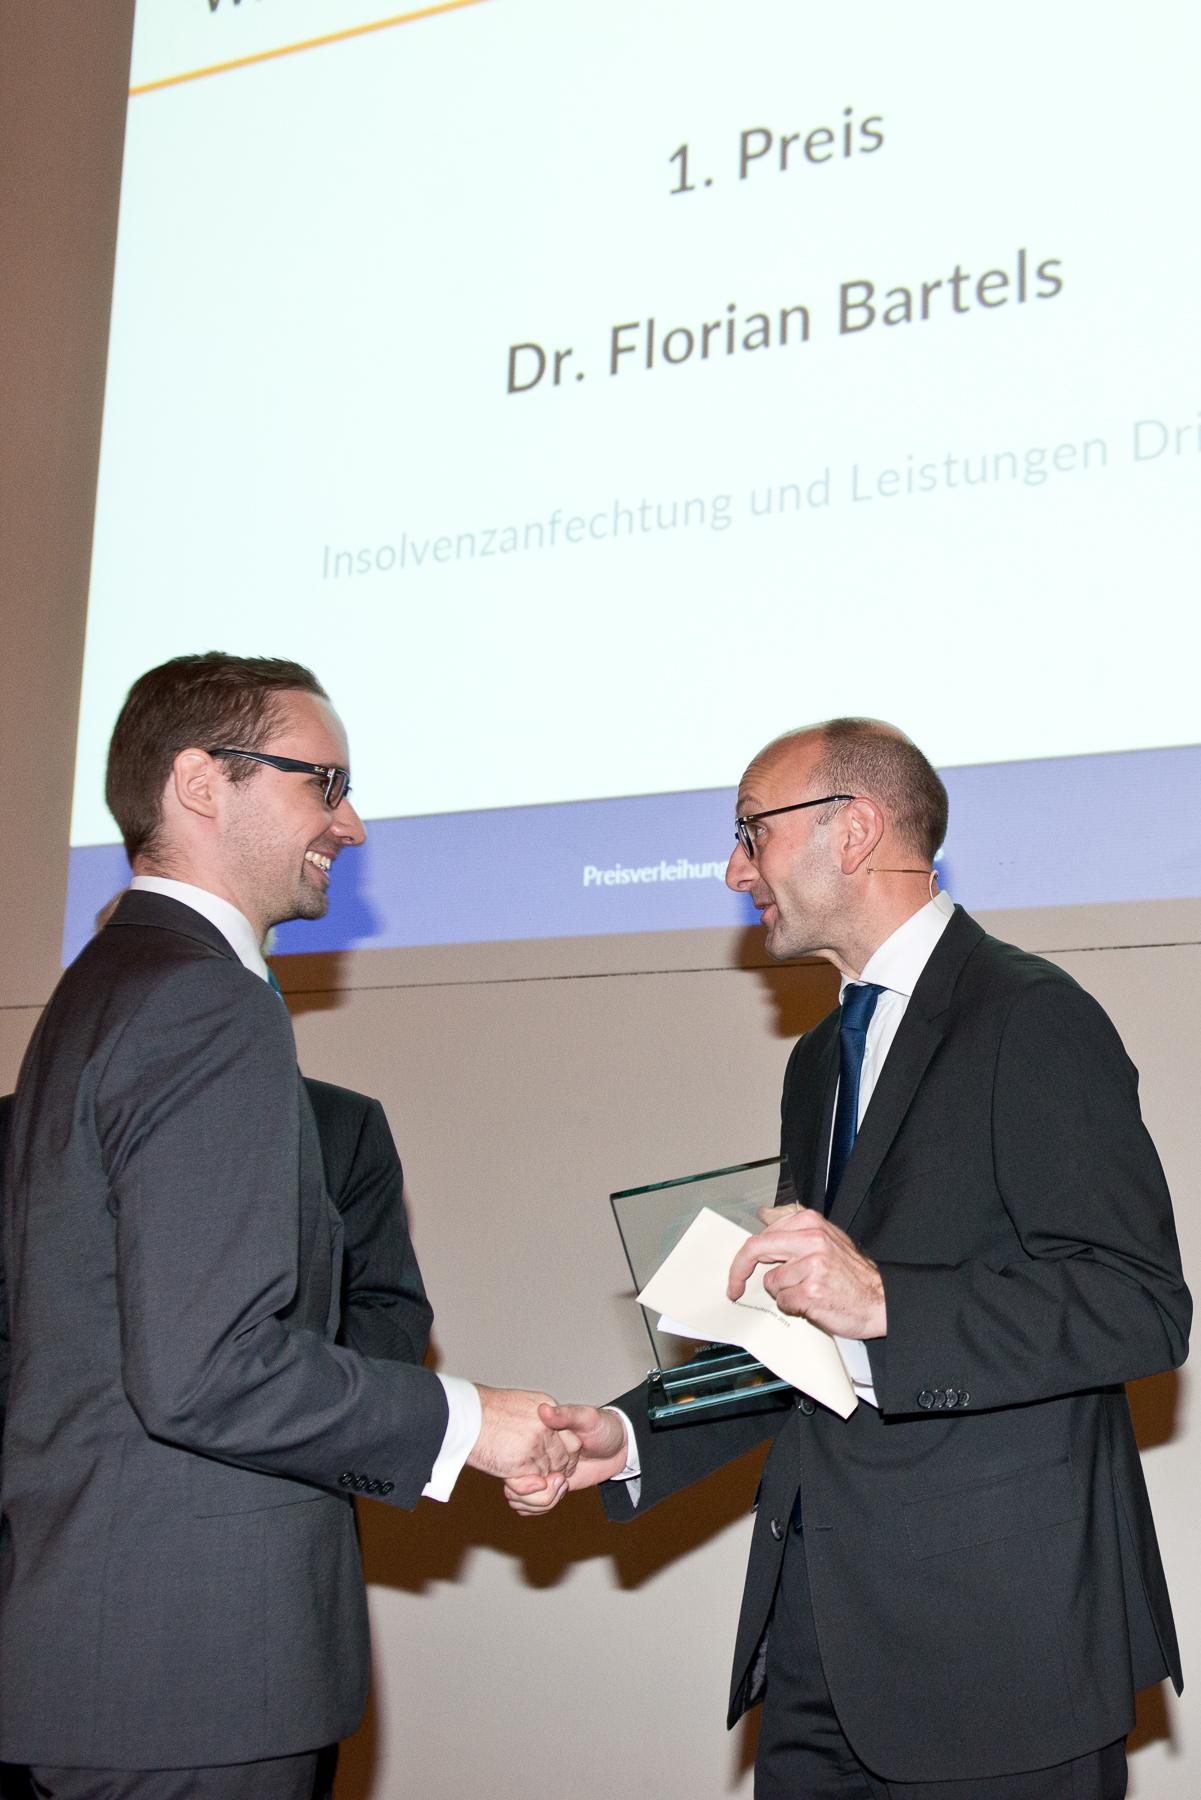 Dr. Florian Bartels (1. Preis), Prof. Dr. Lucas F. Flöther